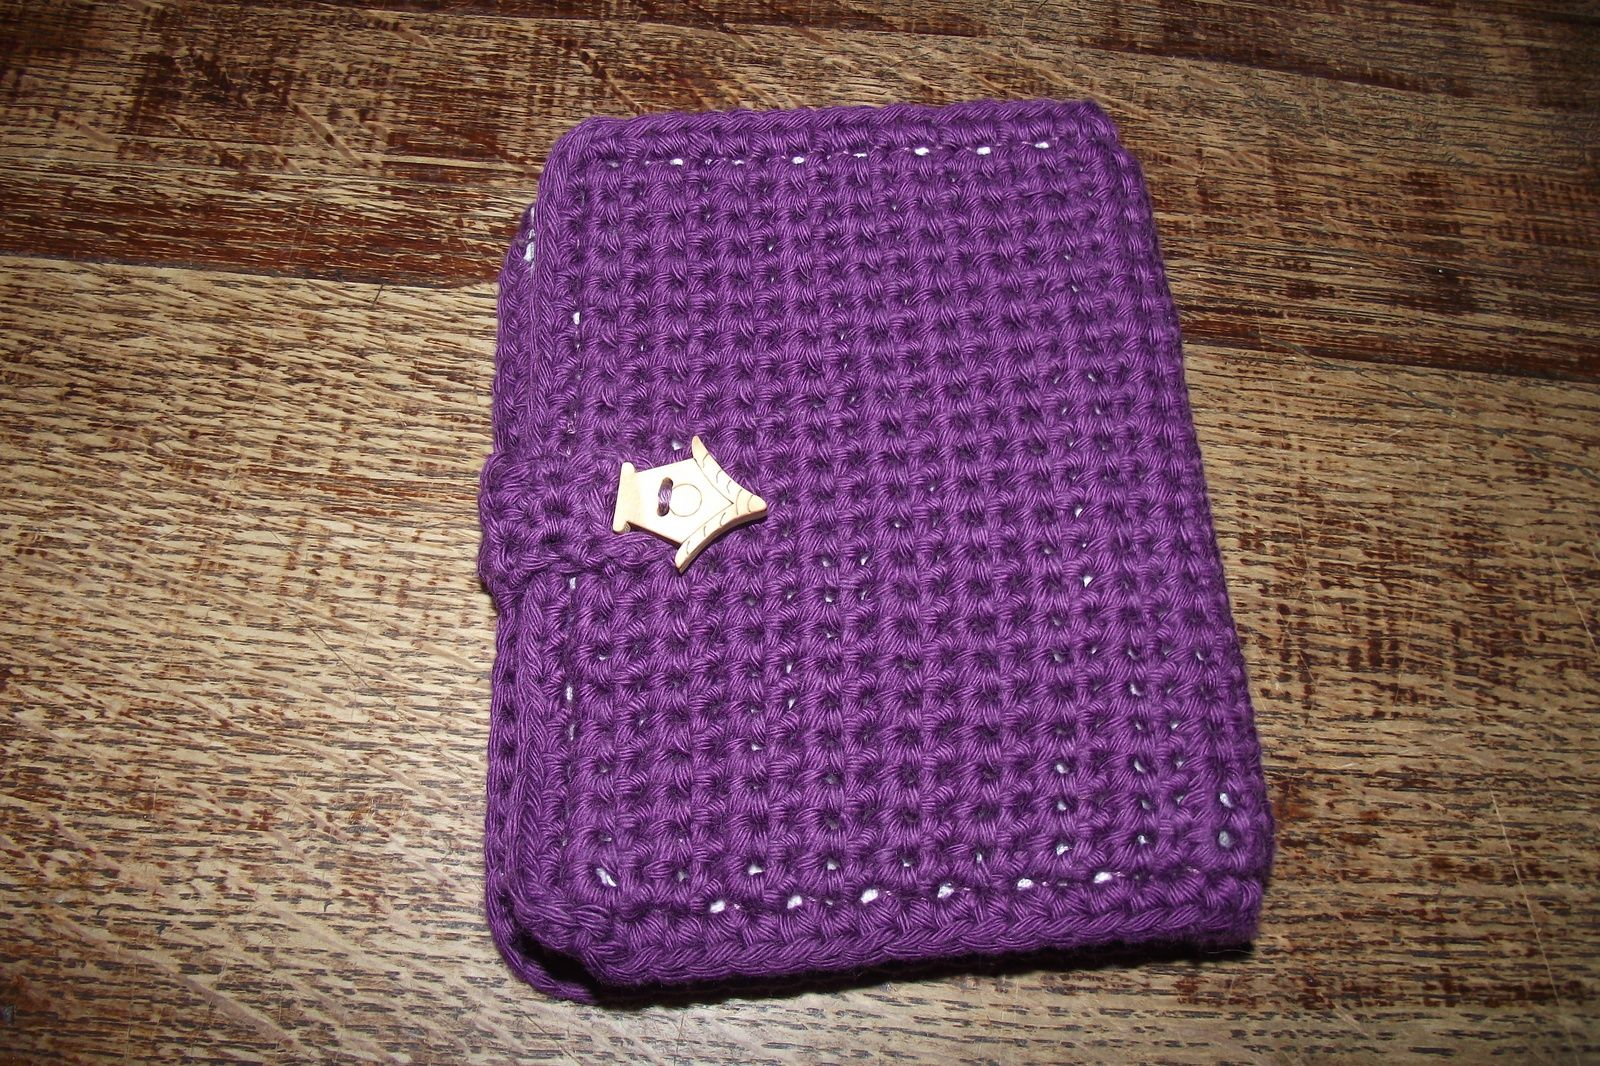 couture: porte monnaie du chouette kit n°11